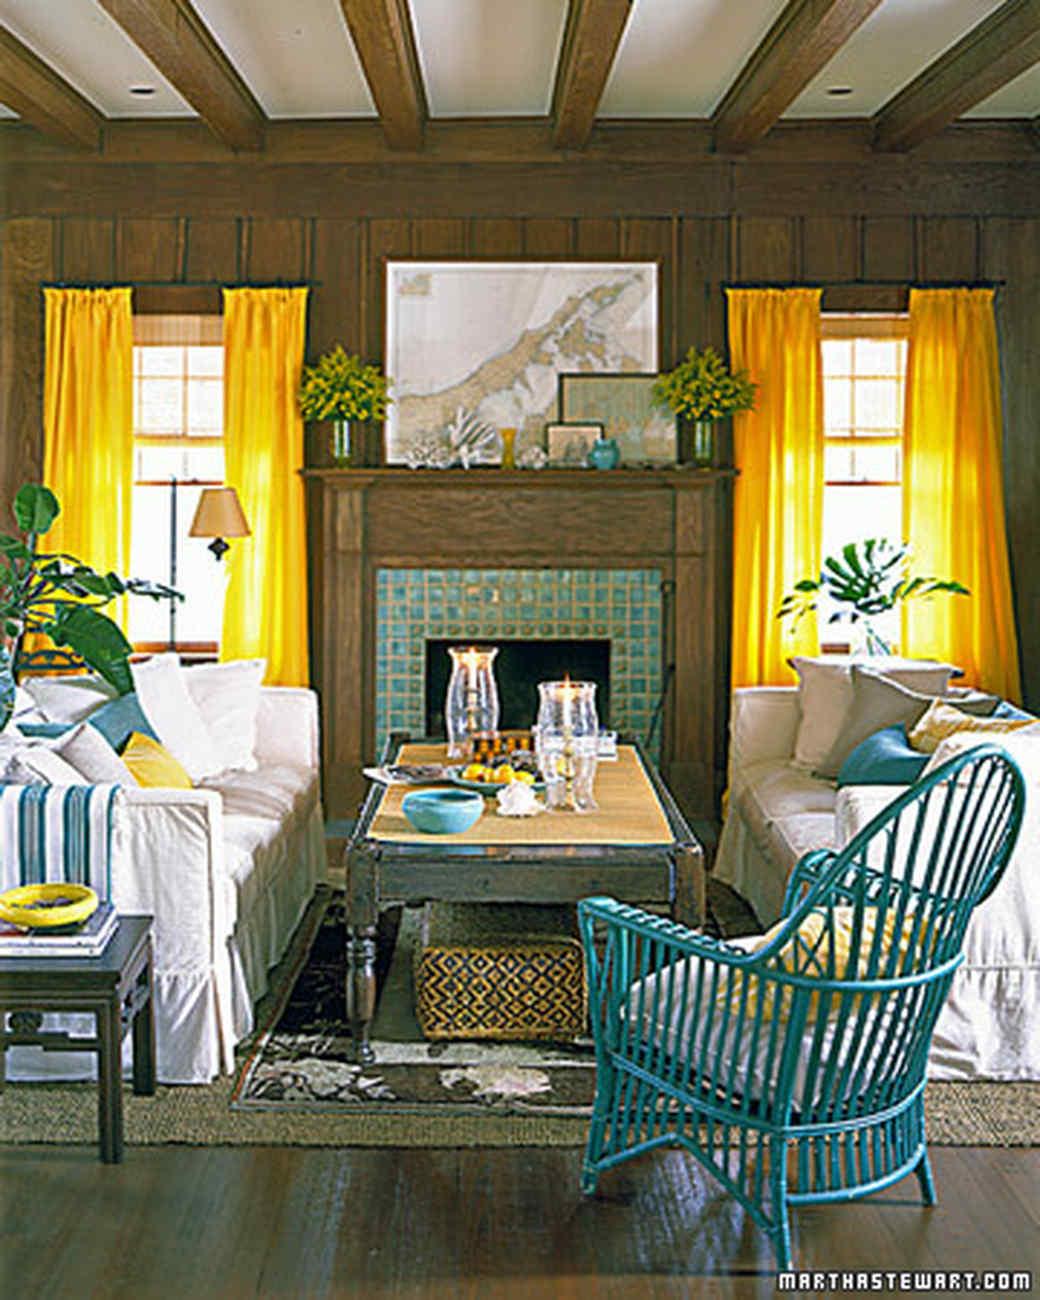 mla_0998_livingroom.jpg